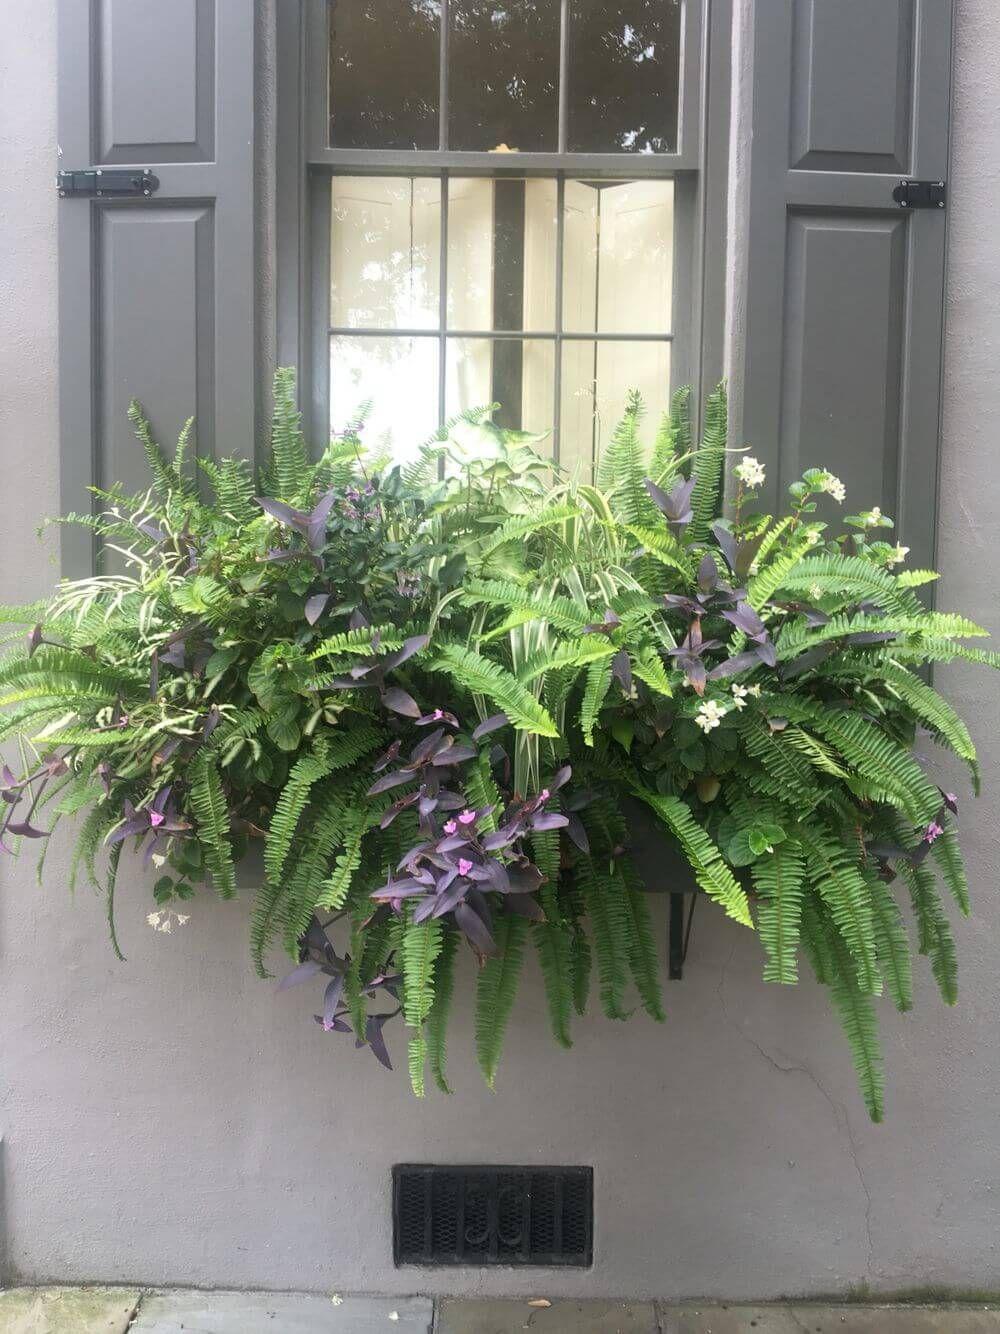 17 Beautiful Window Box Ideas that Will Make Your Window More Stylish